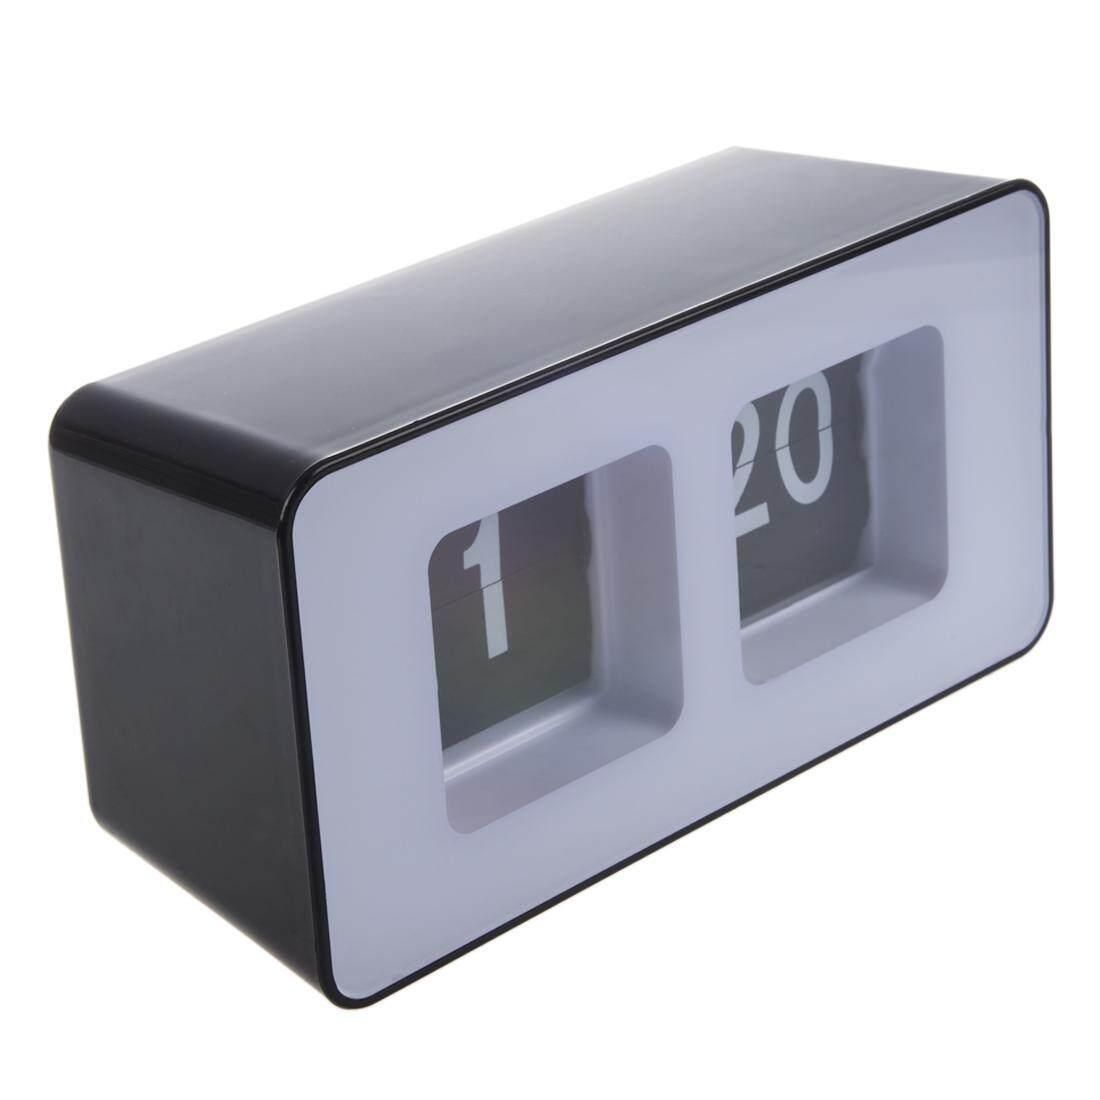 Low Cost Retro Auto Flip Clock Classic Stylish Modern Desk Wall Clock Intl